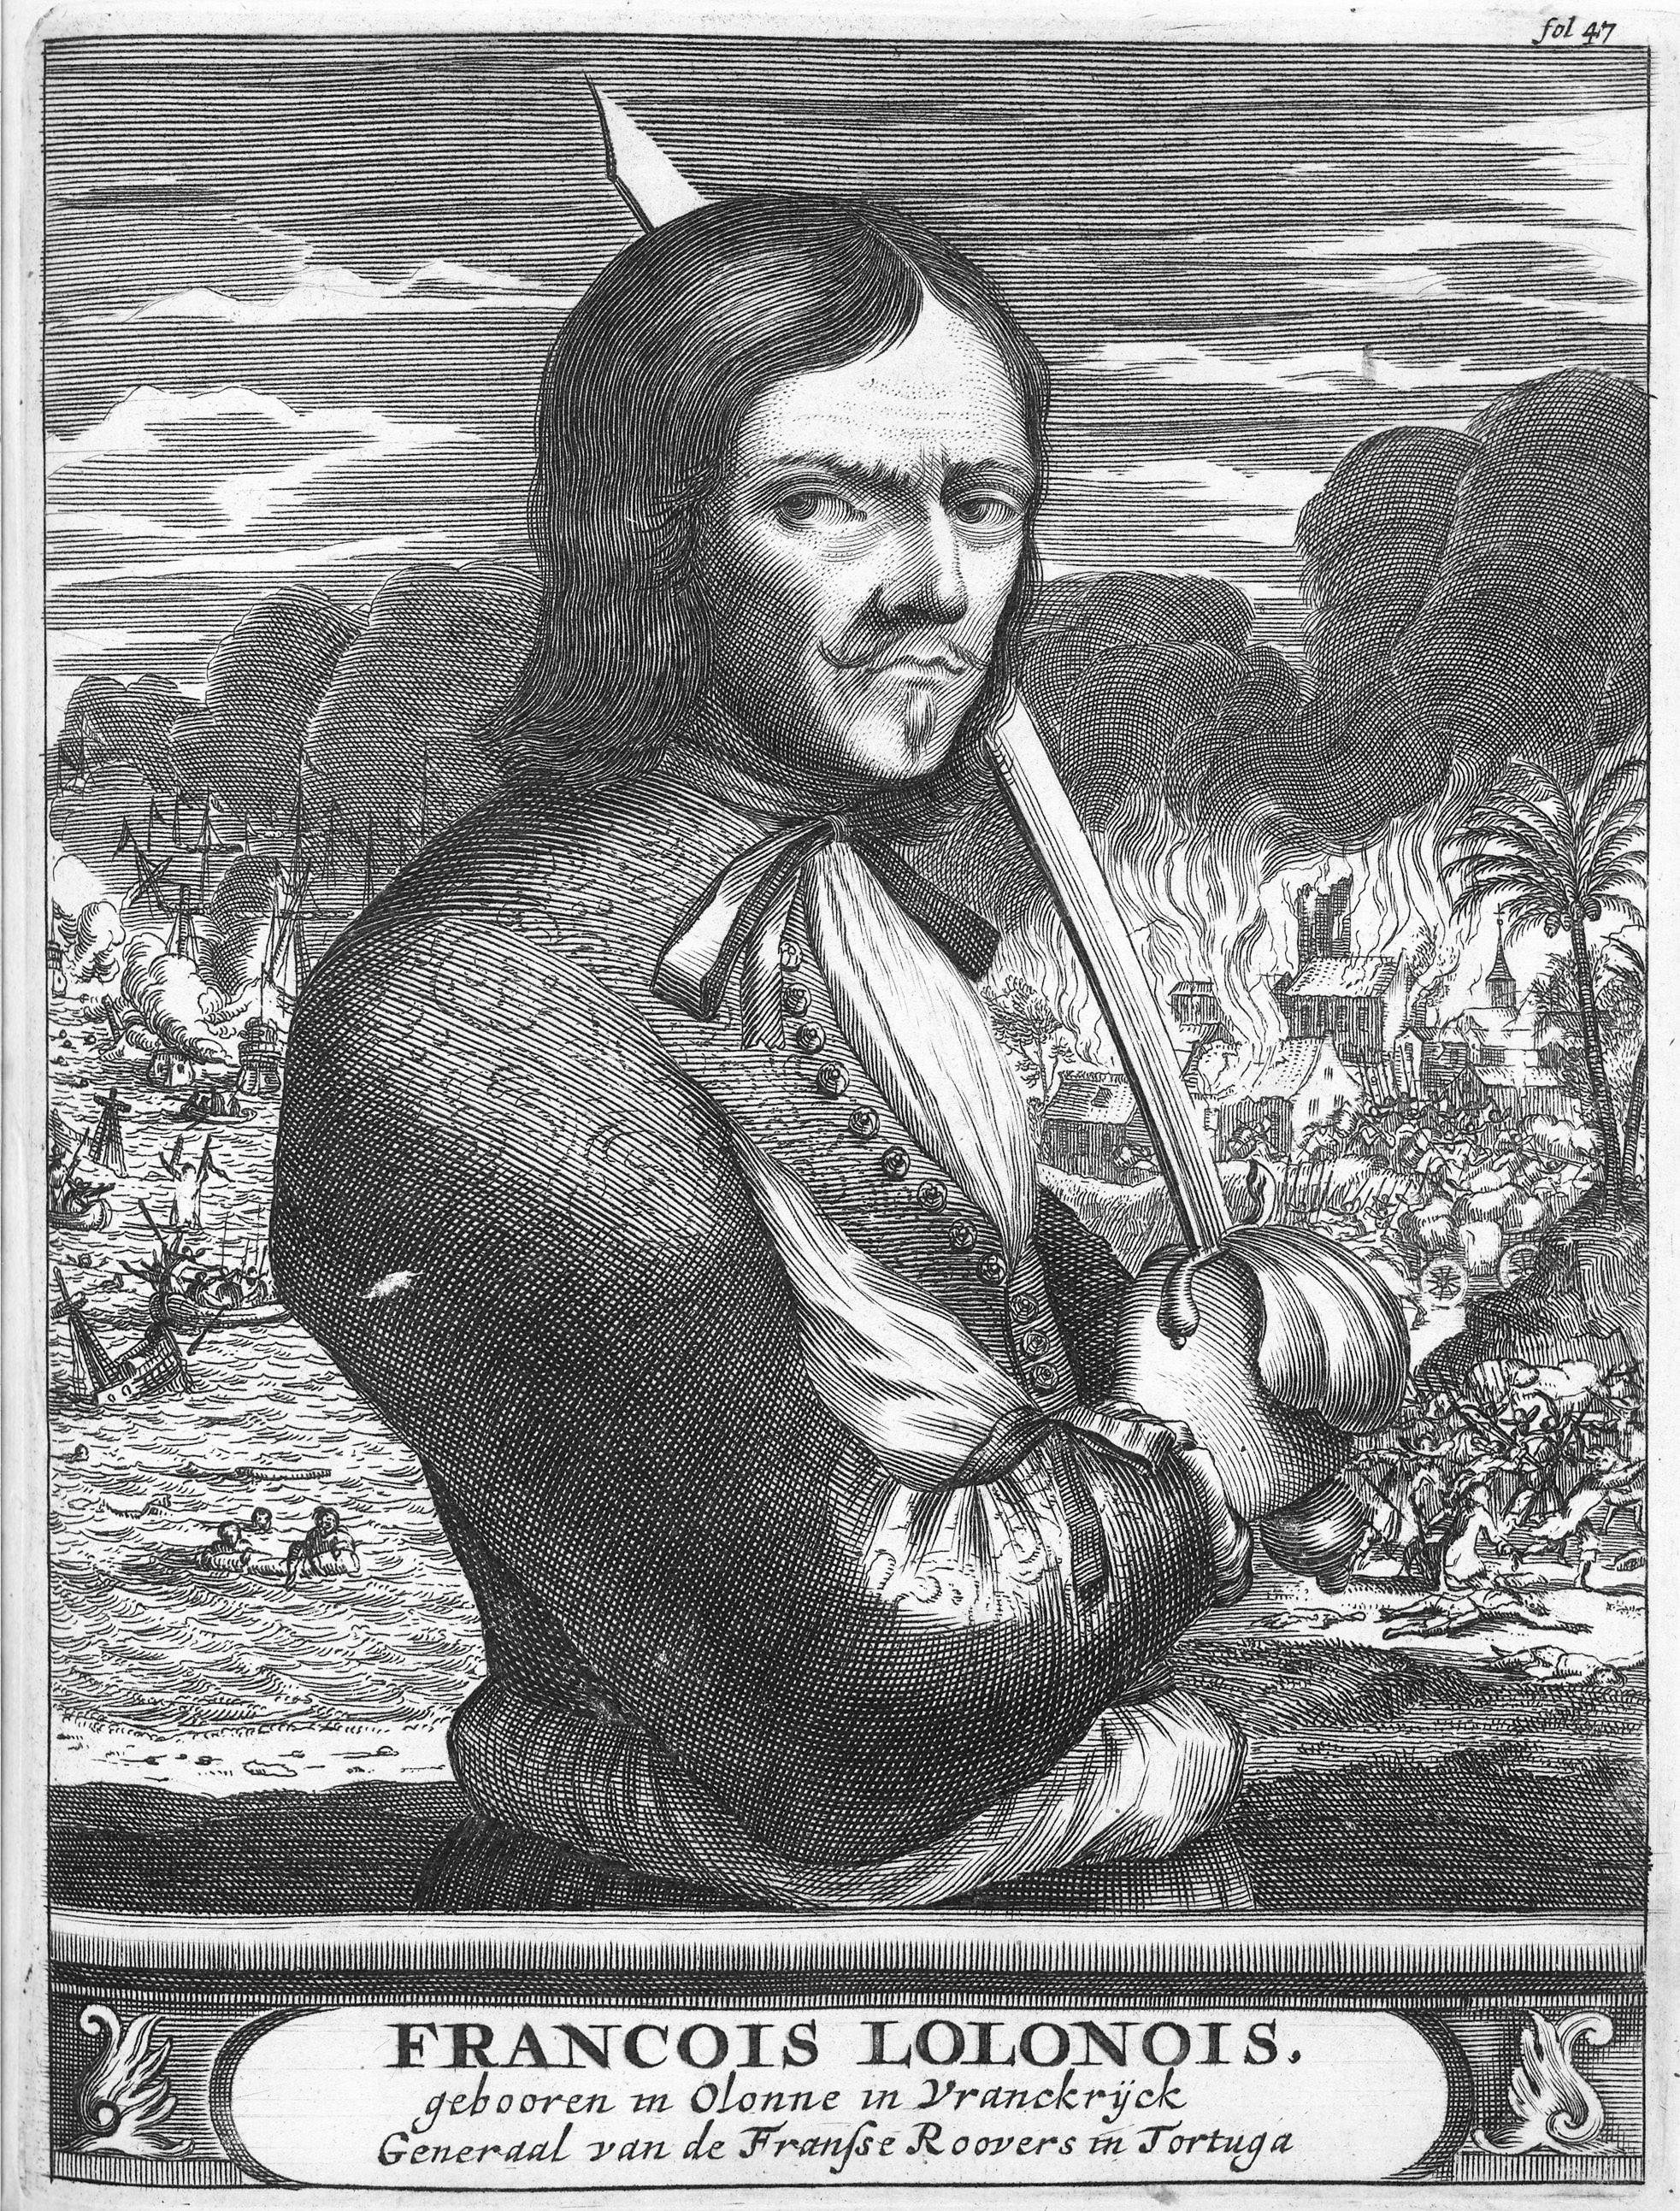 European Pirates Burned Honduran Towns During The Colonial Era